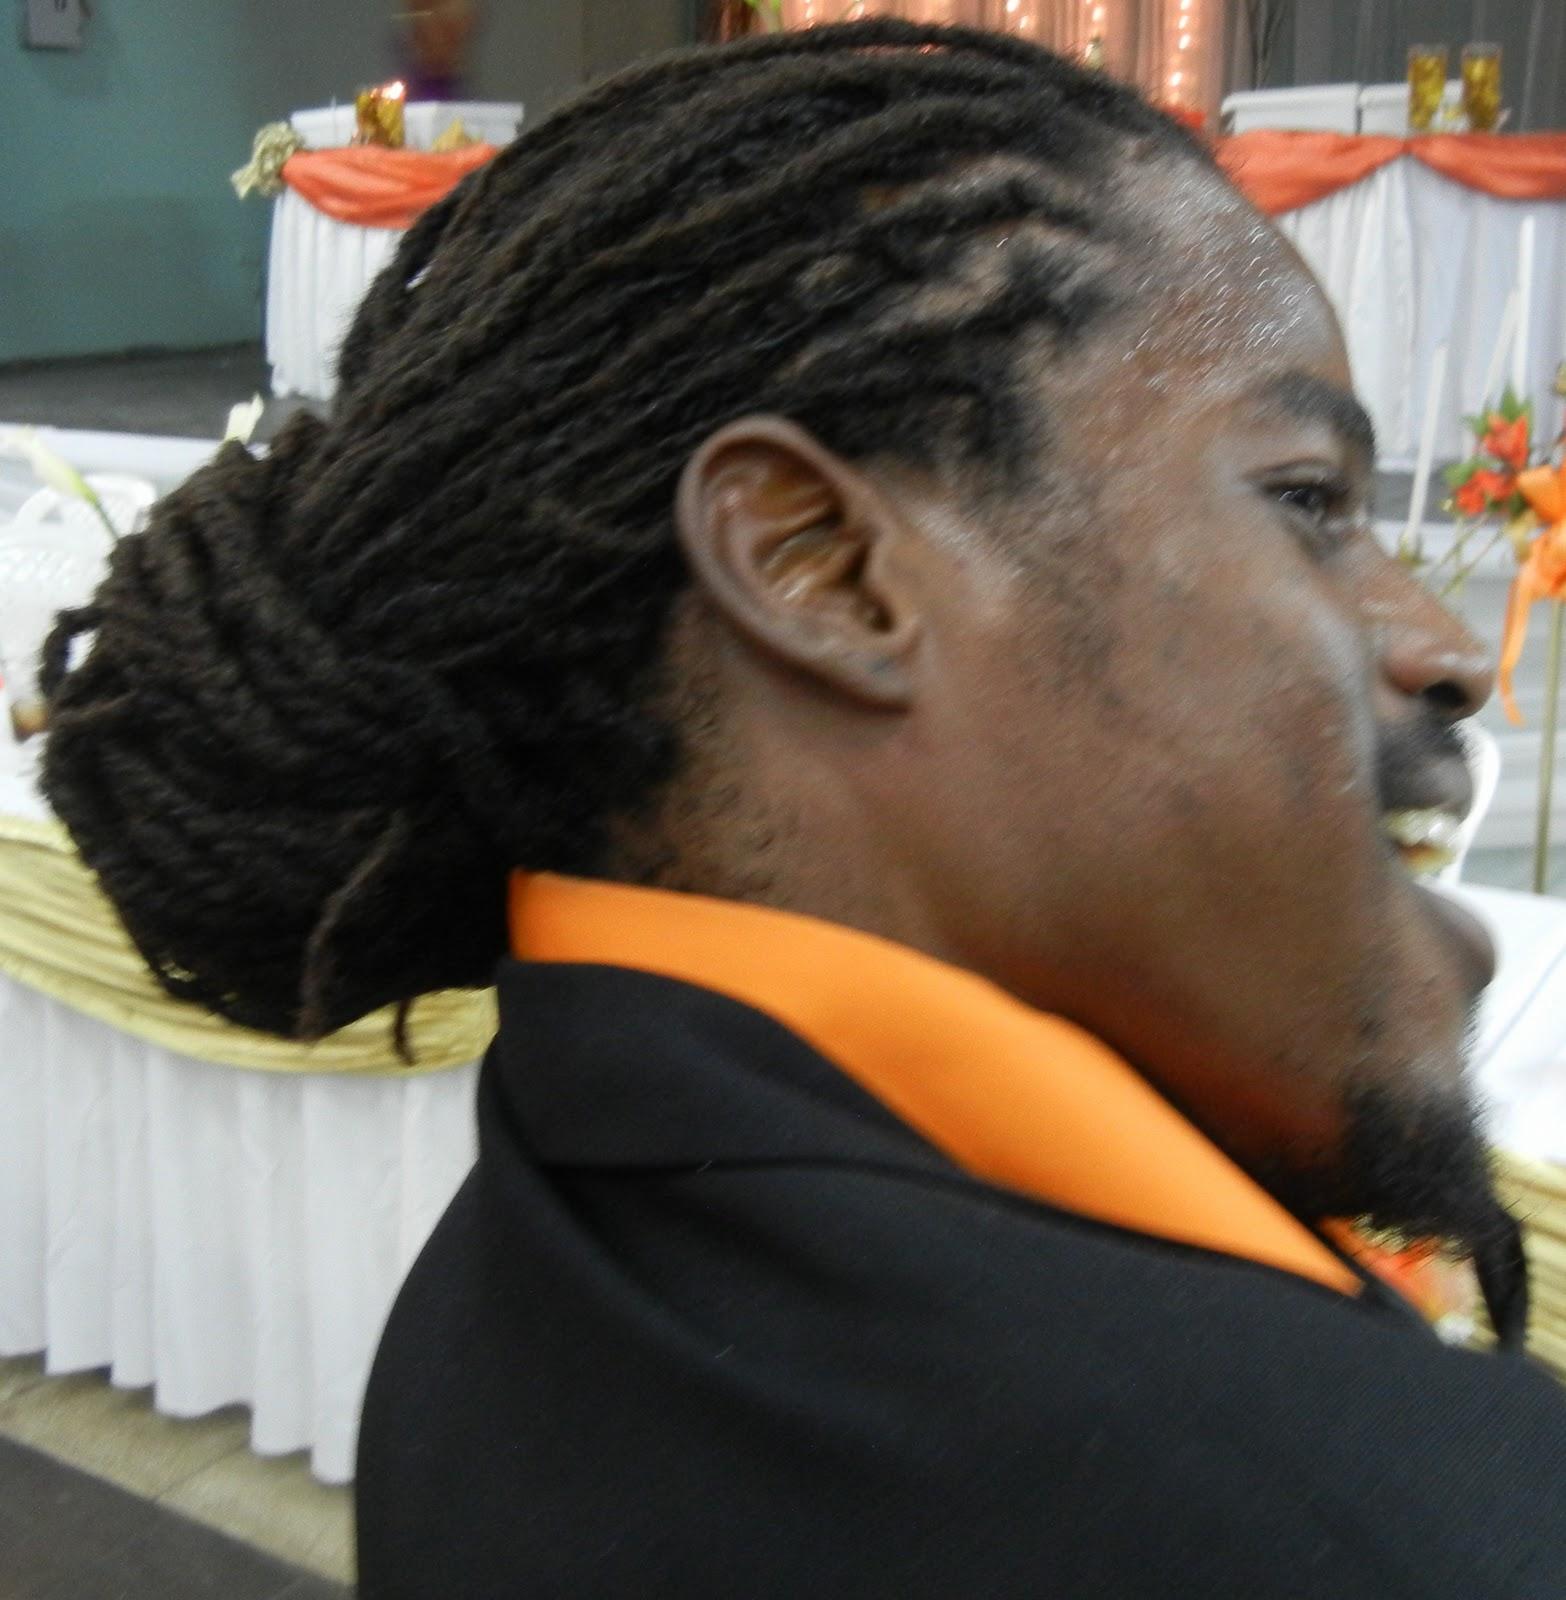 http://1.bp.blogspot.com/-vWHBNGPCRG4/TZKsVIBPRDI/AAAAAAAAAN8/KiGsOzUHGPs/s1600/DSCN0581.JPG